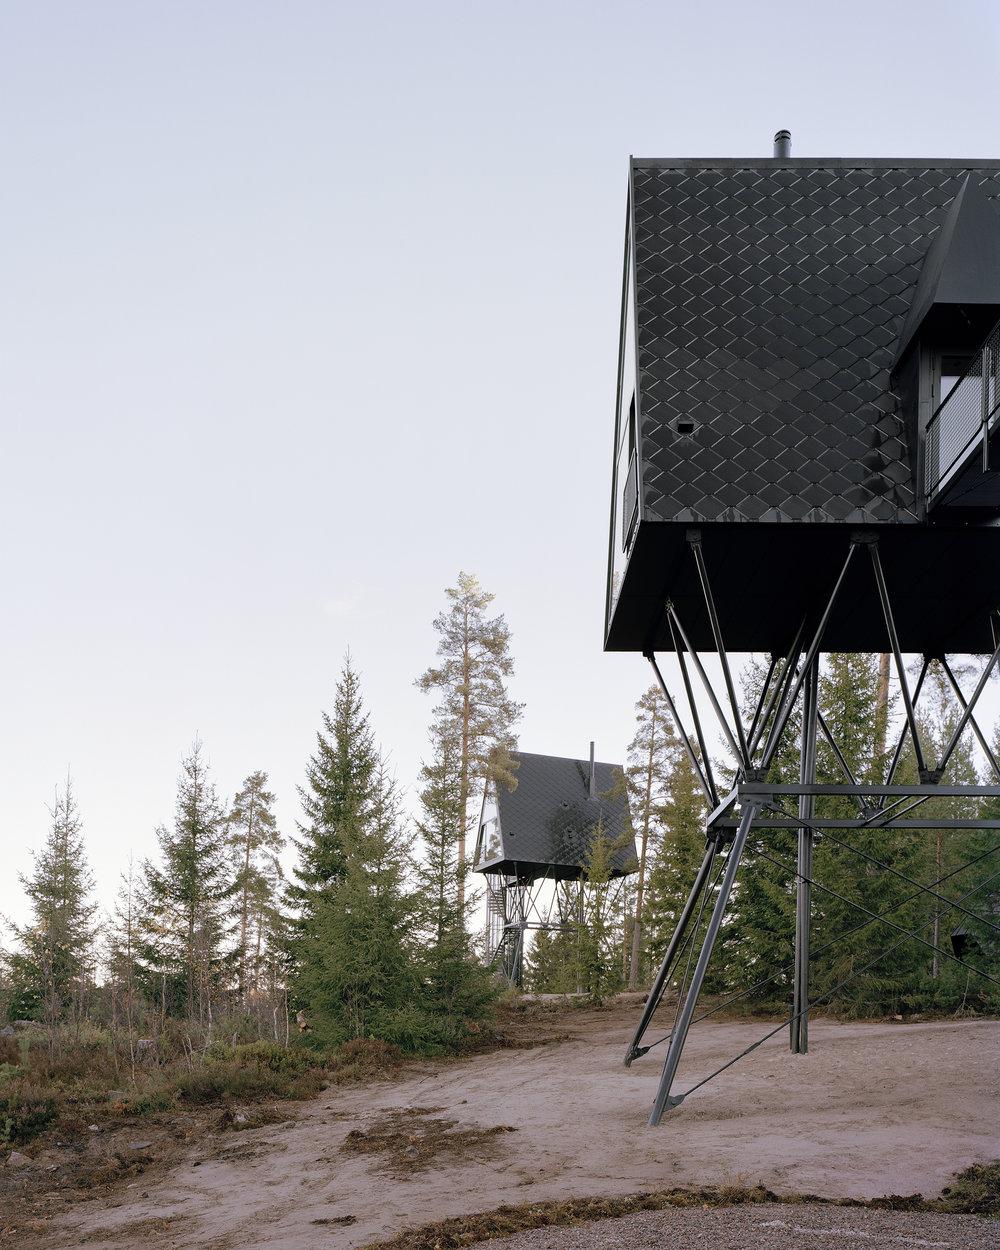 espen surnevik PAN cabins 15 photo Rasmus Norlander.jpg